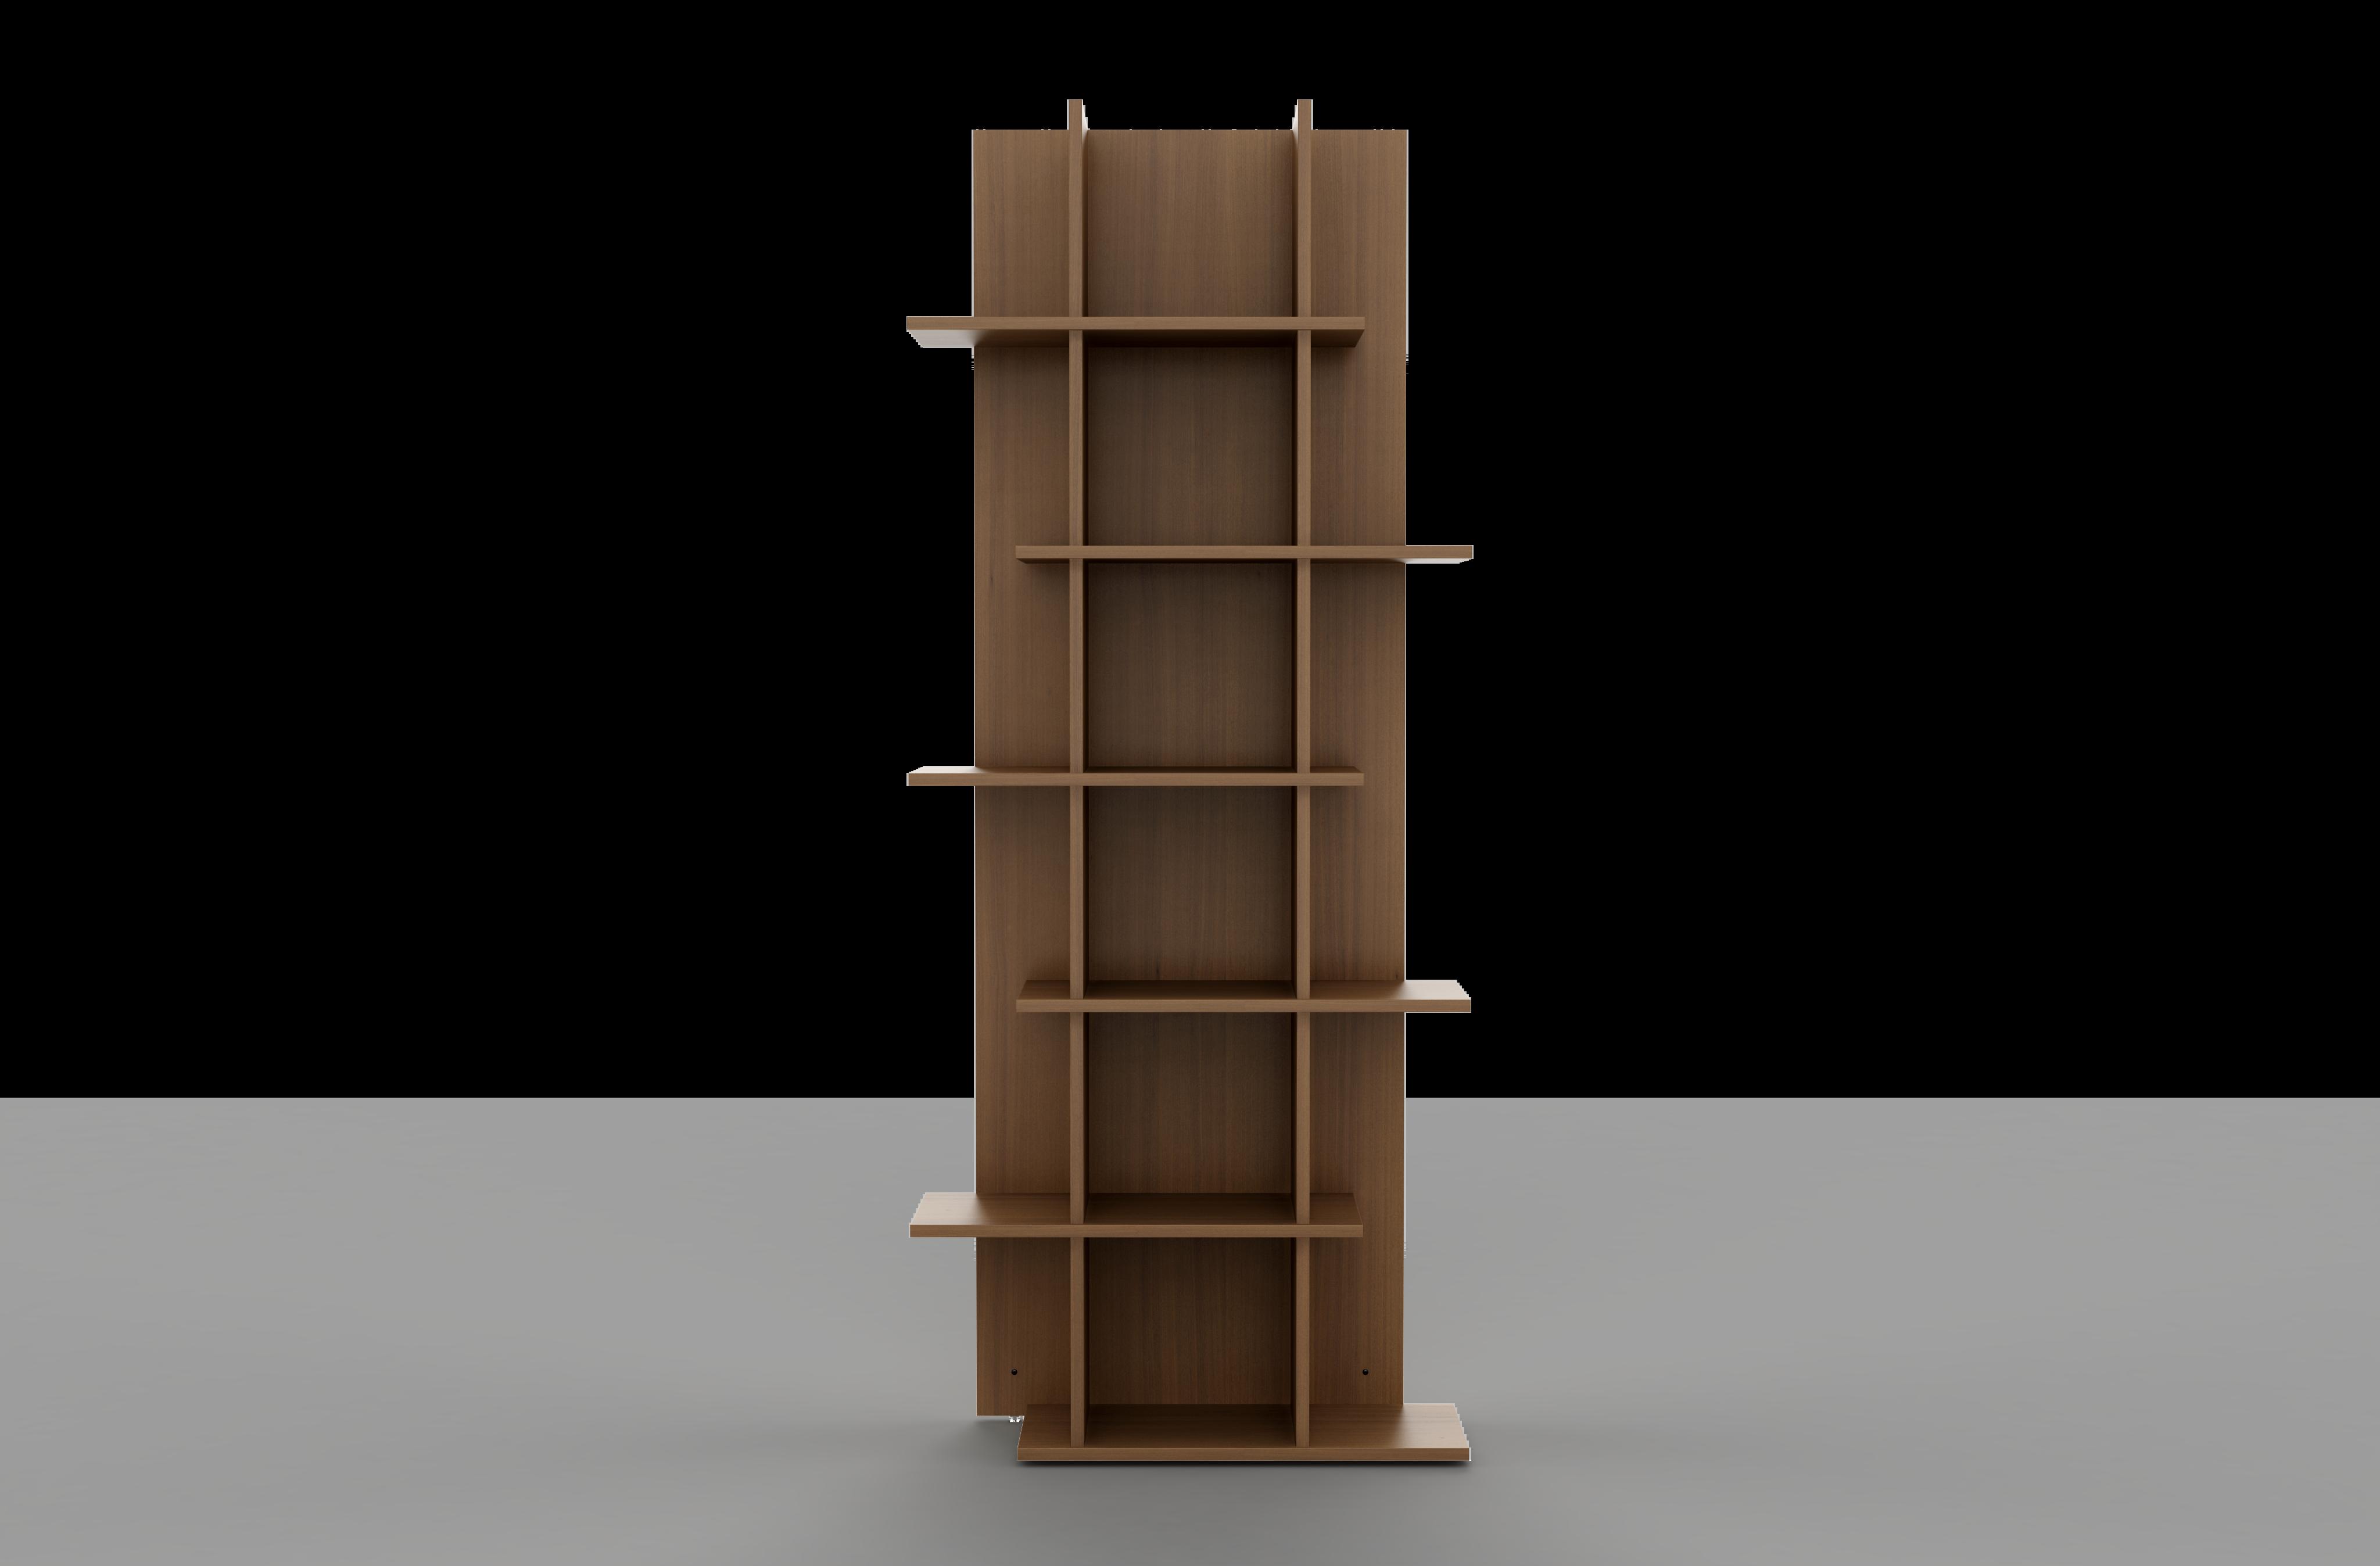 oka bookcases shelving designer kazuko okamoto. Black Bedroom Furniture Sets. Home Design Ideas